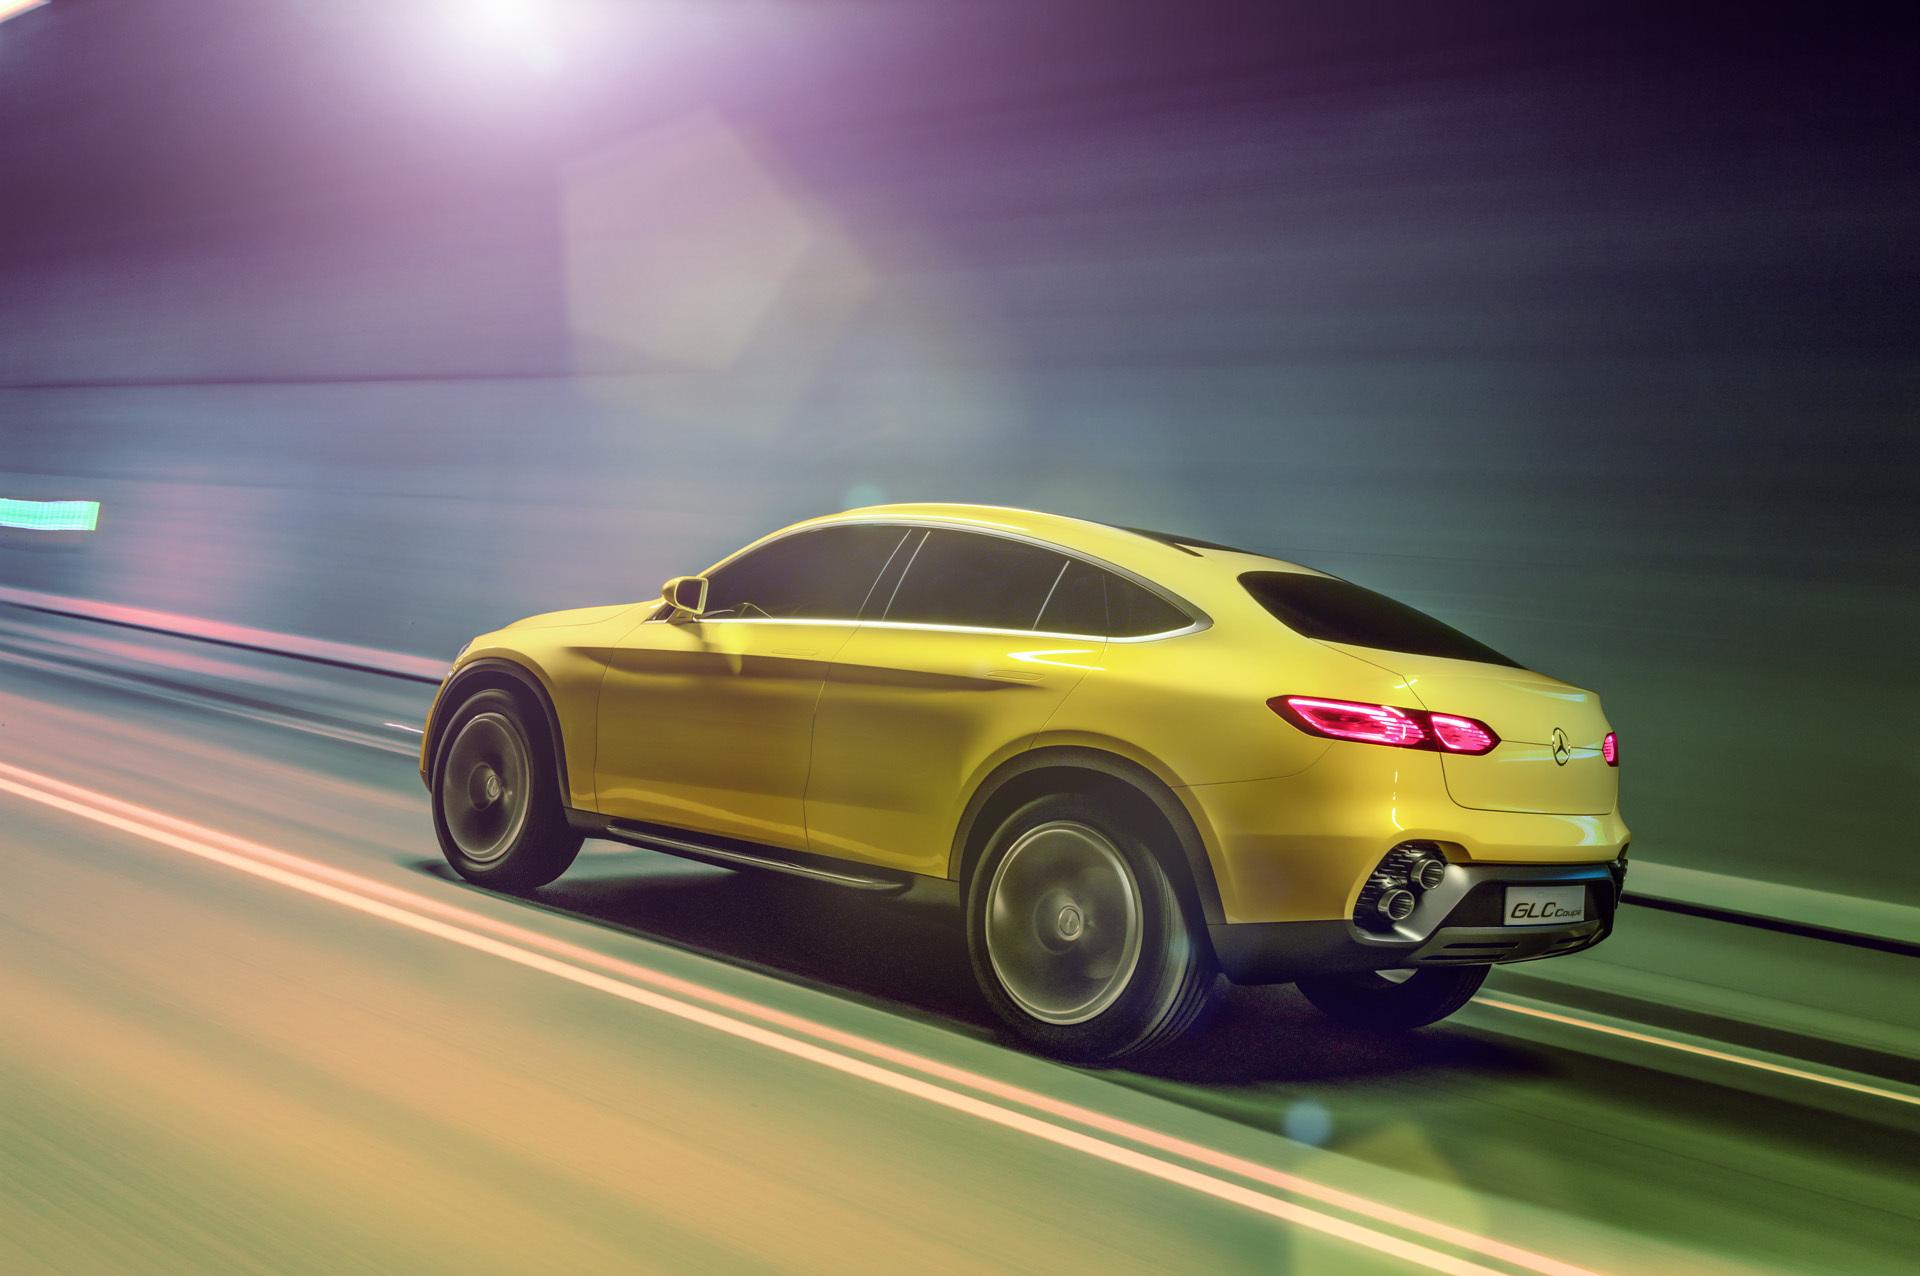 2015 mercedes benz glc coupe concepts for Mercedes benz concept coupe